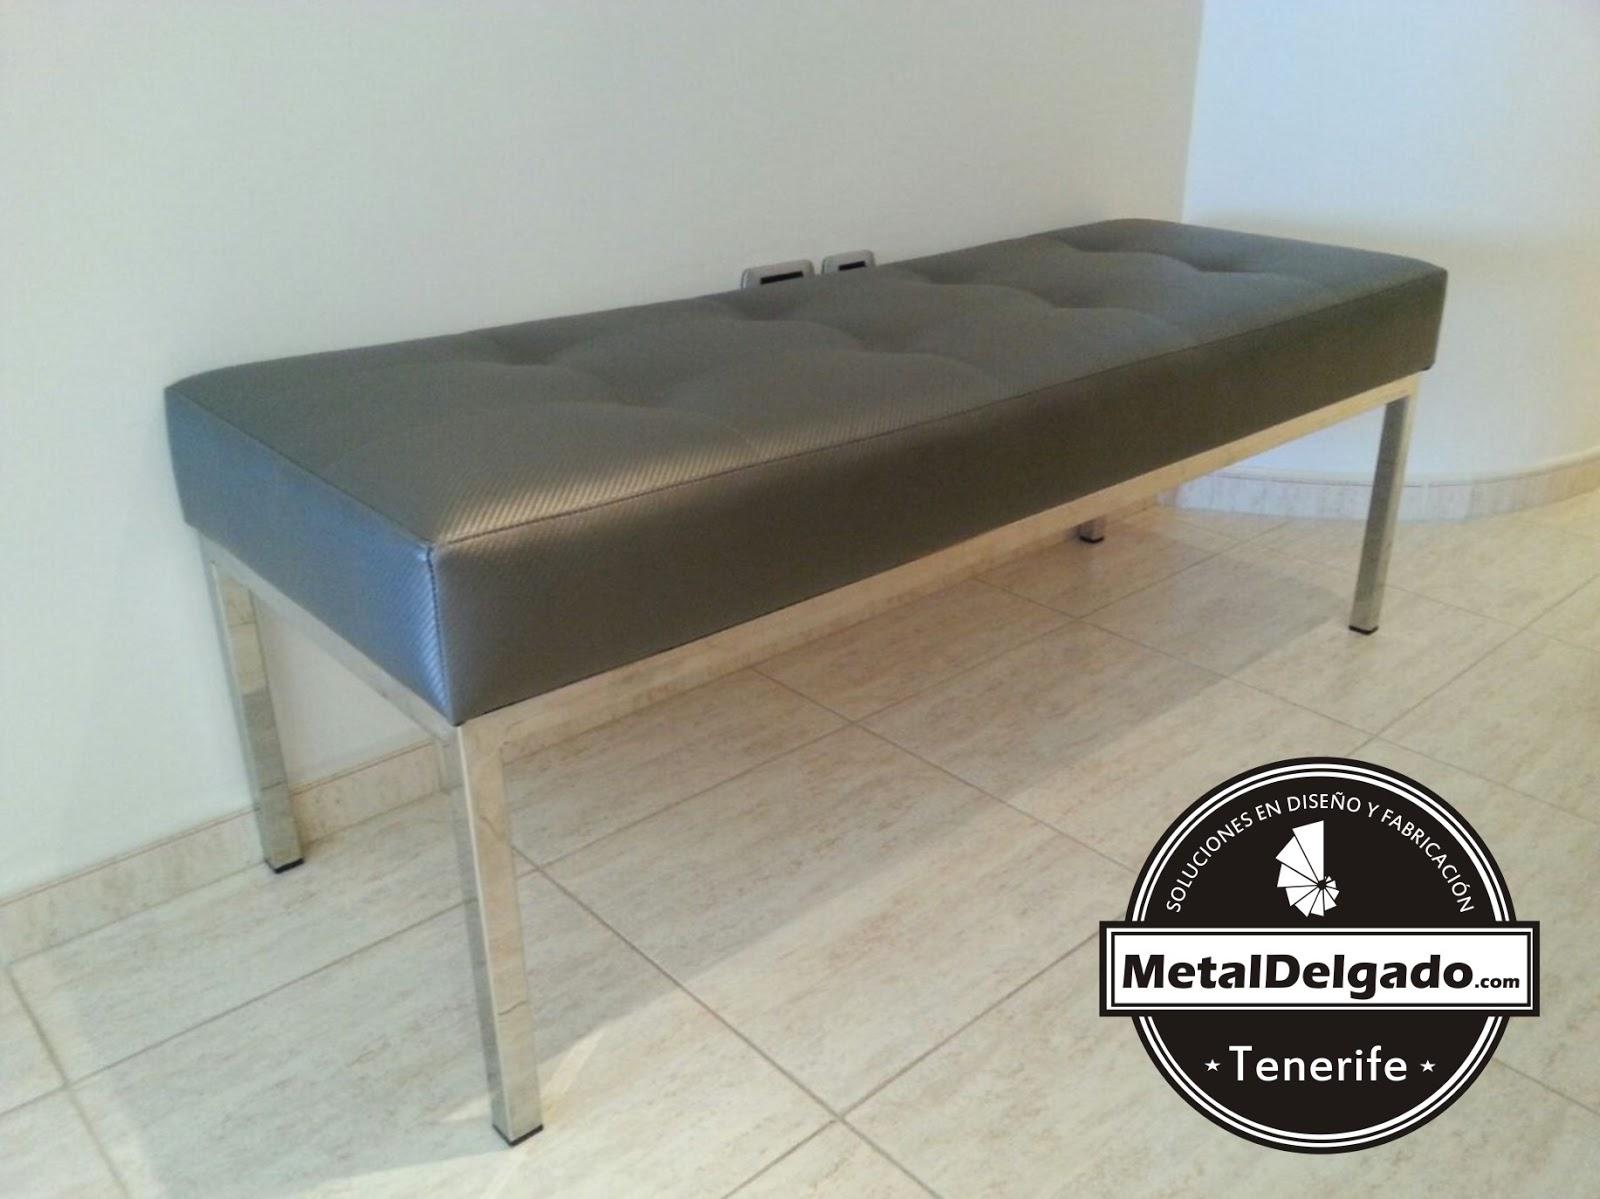 Acero inoxidable tenerife fabricaci n de muebles acero for Decoracion hogar tenerife